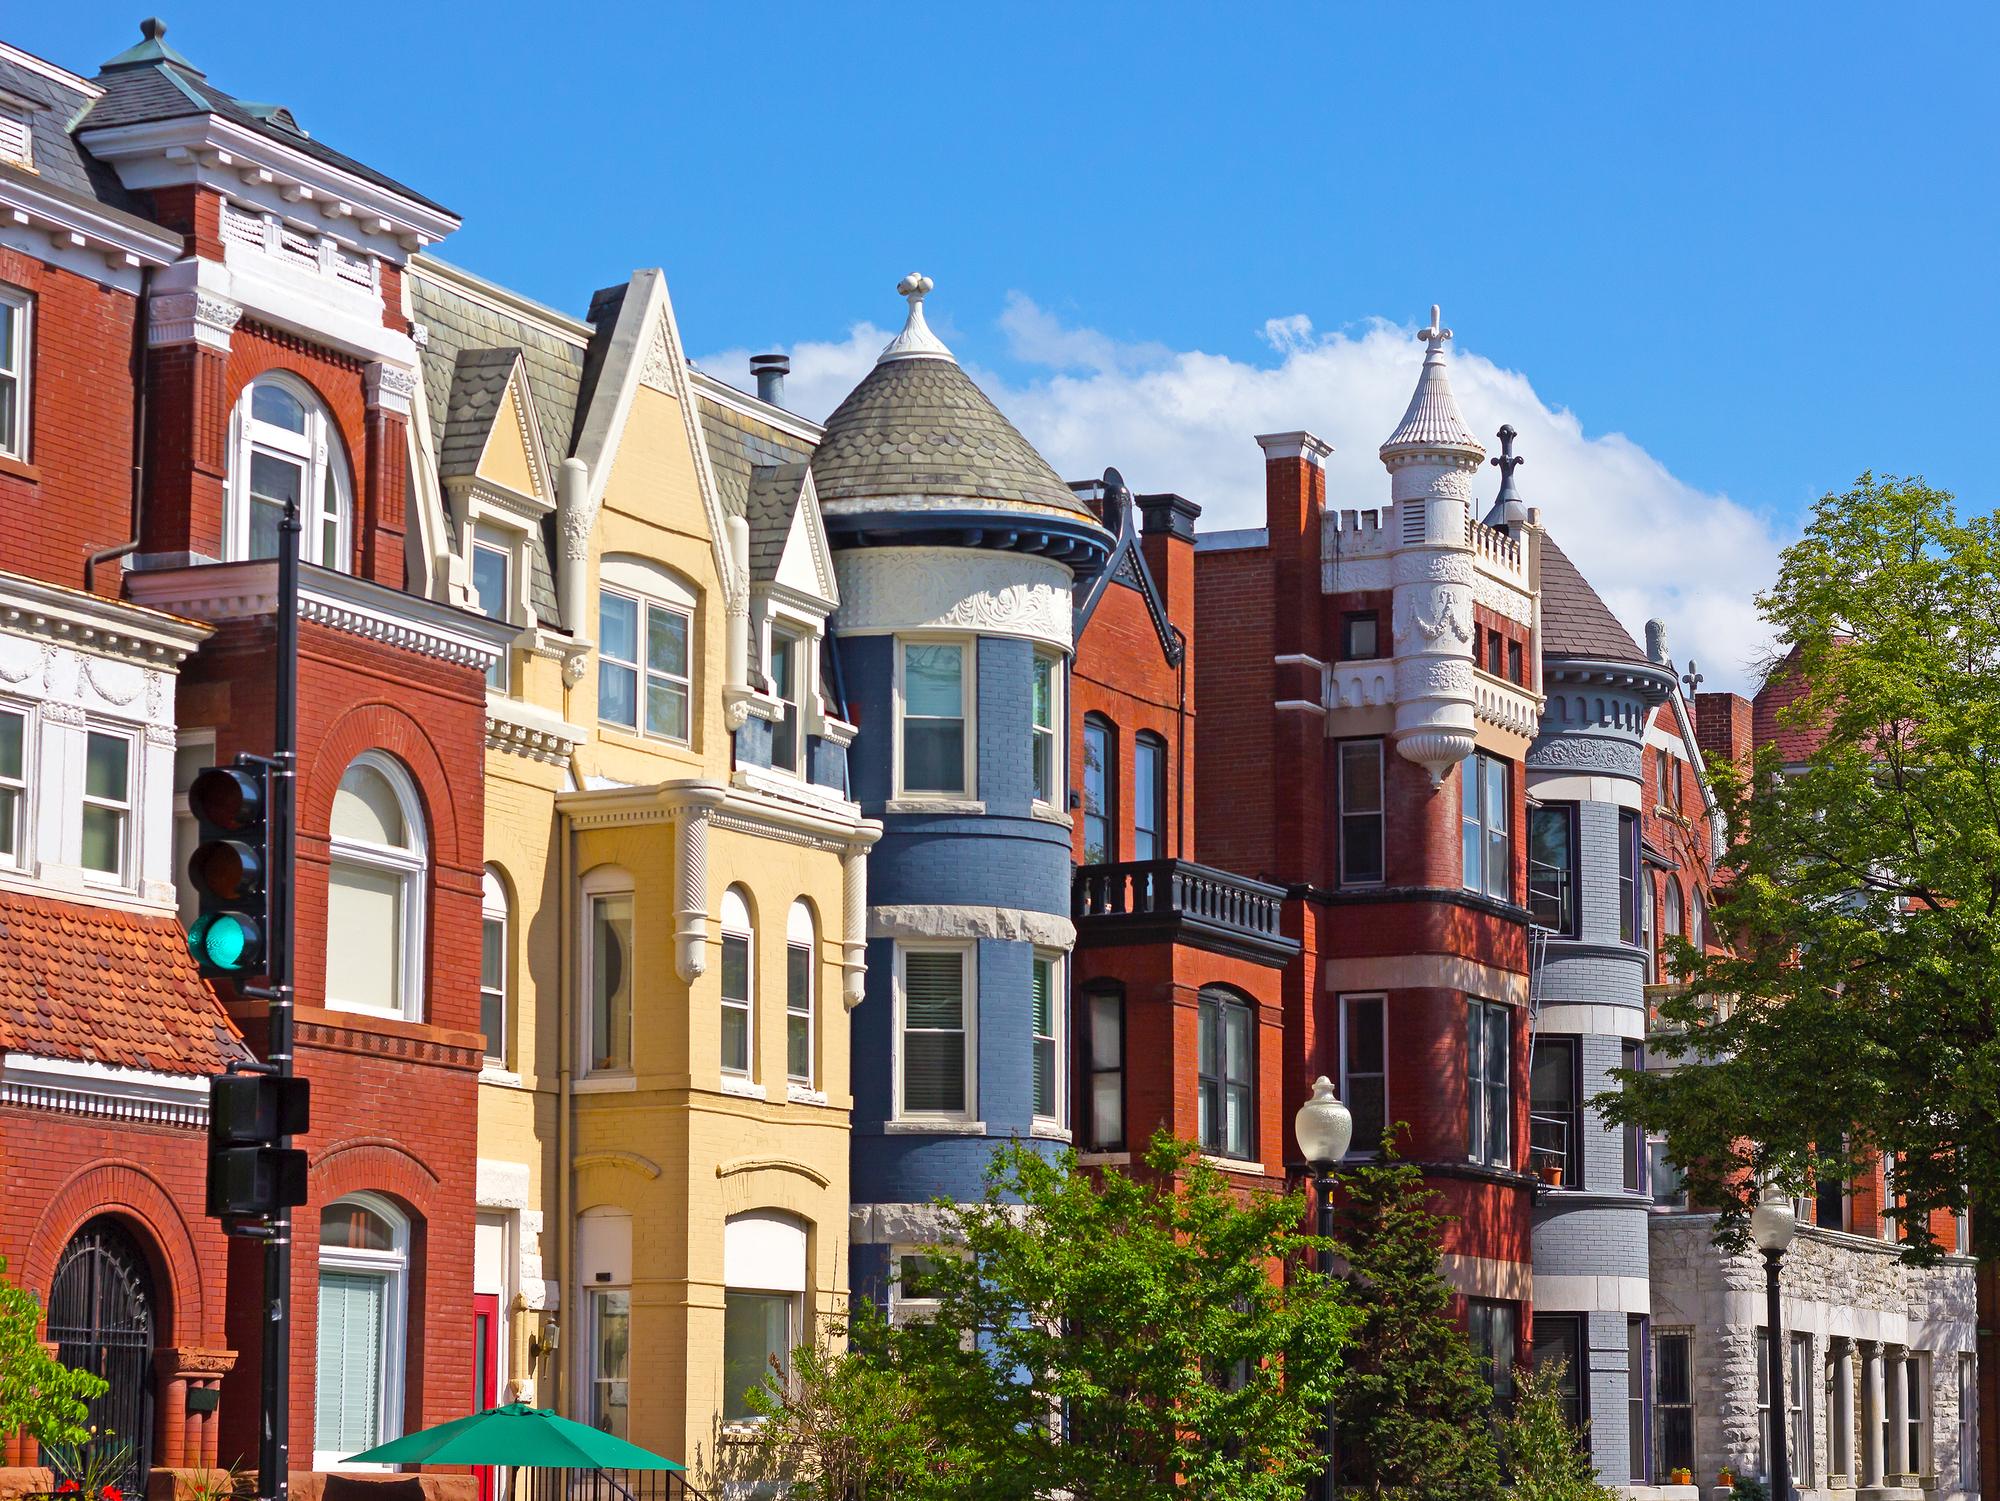 Build Your Portfolio With Skilled Property Management, D.C. Investors